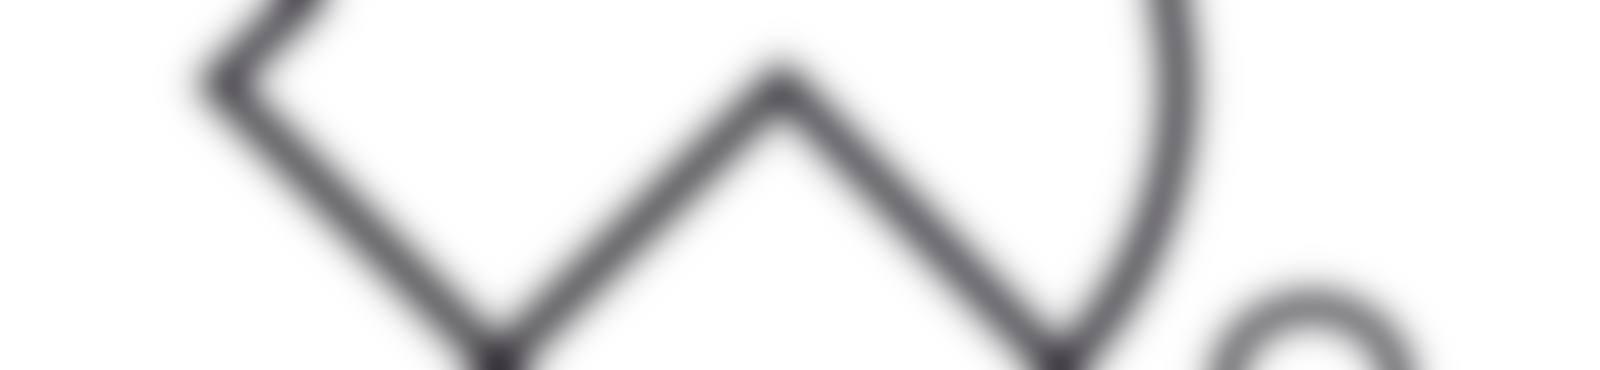 Blurred ballhaus.ost